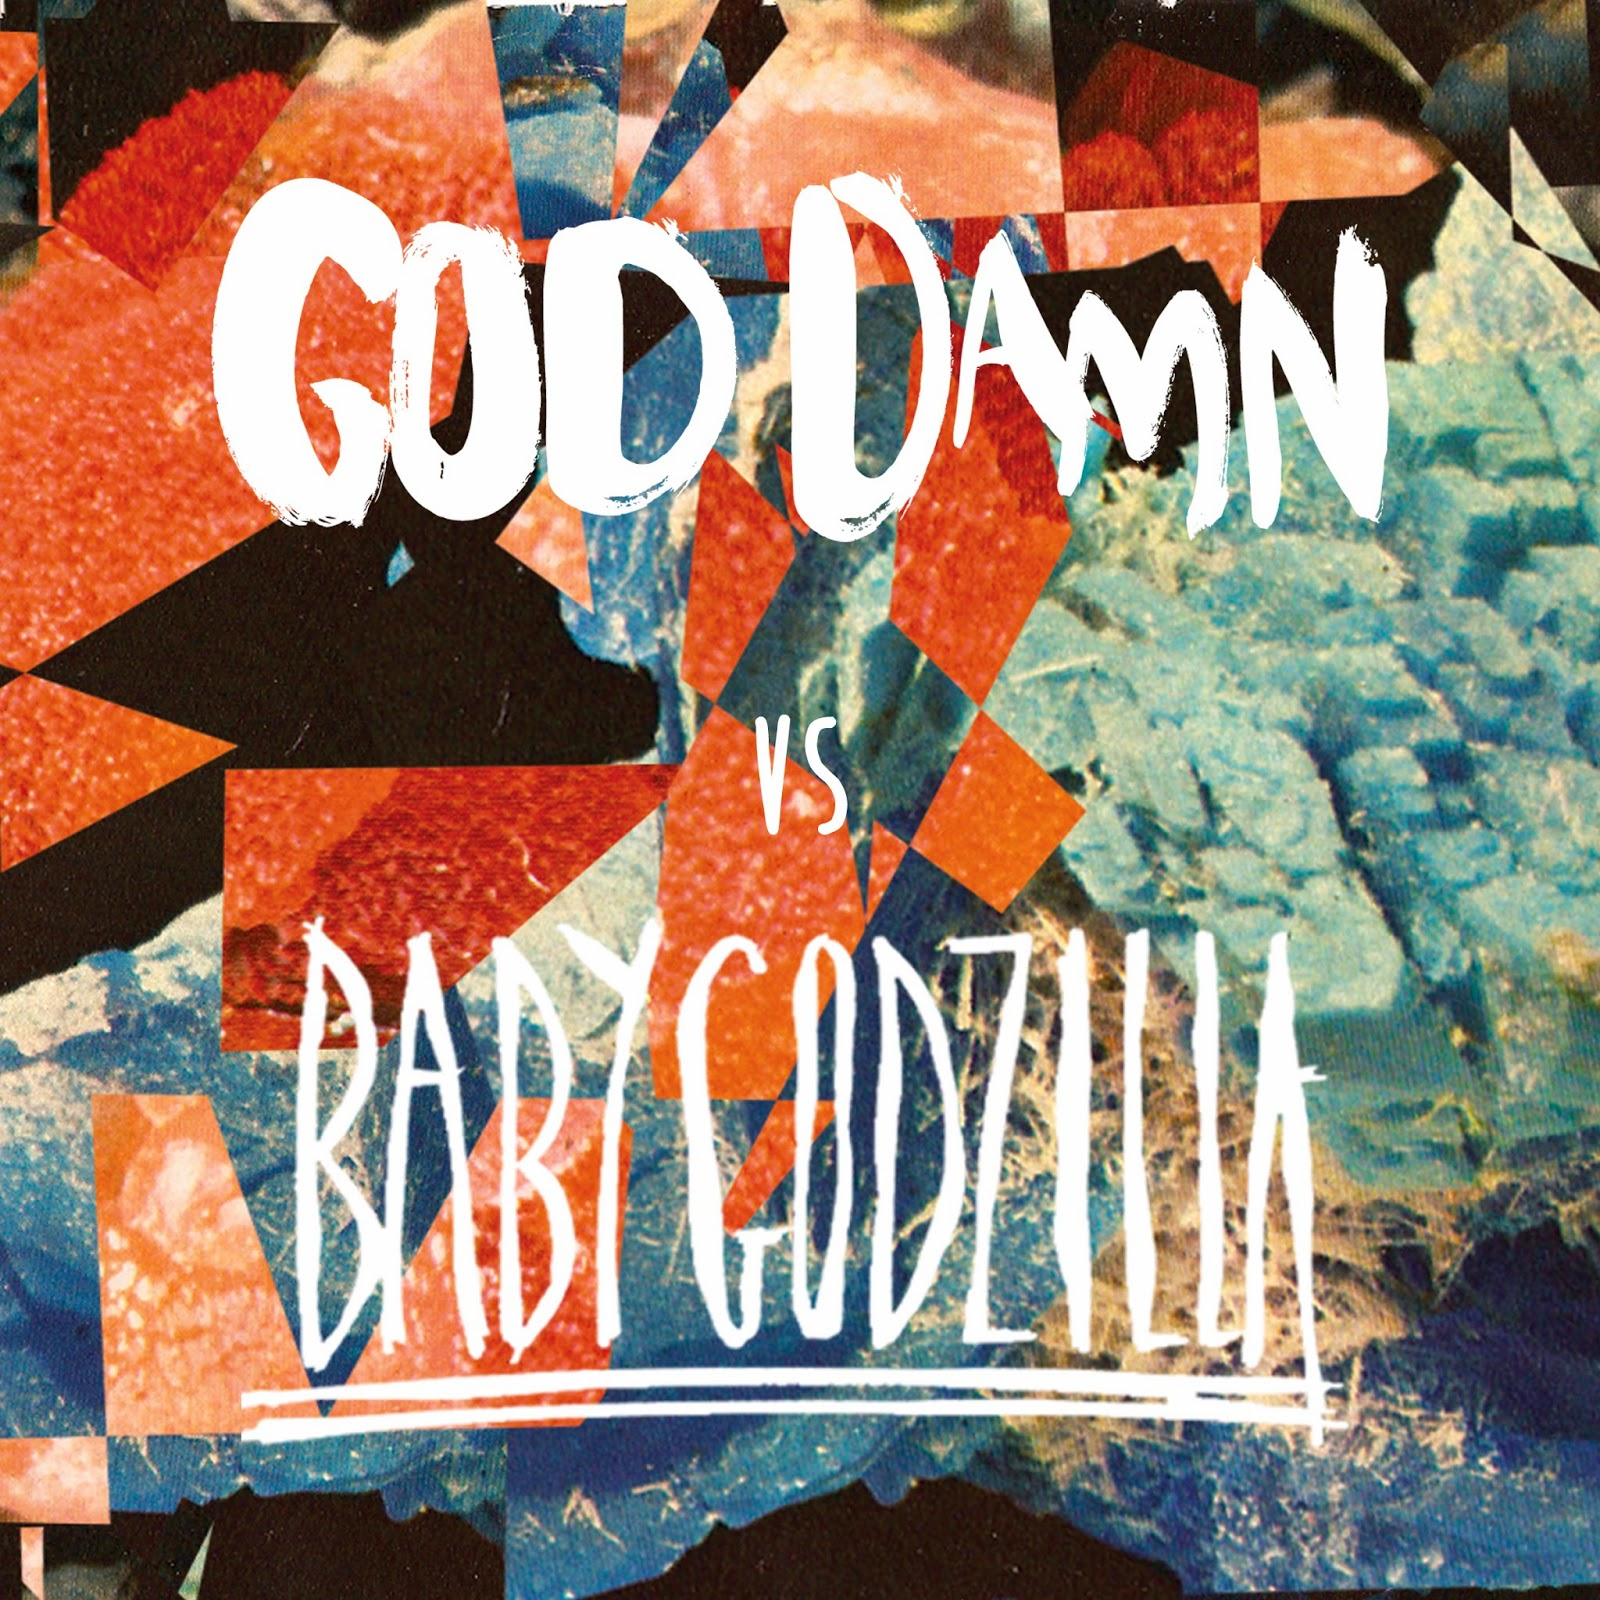 "God Damn 10"" single with Baby Godzilla Record Store Day"